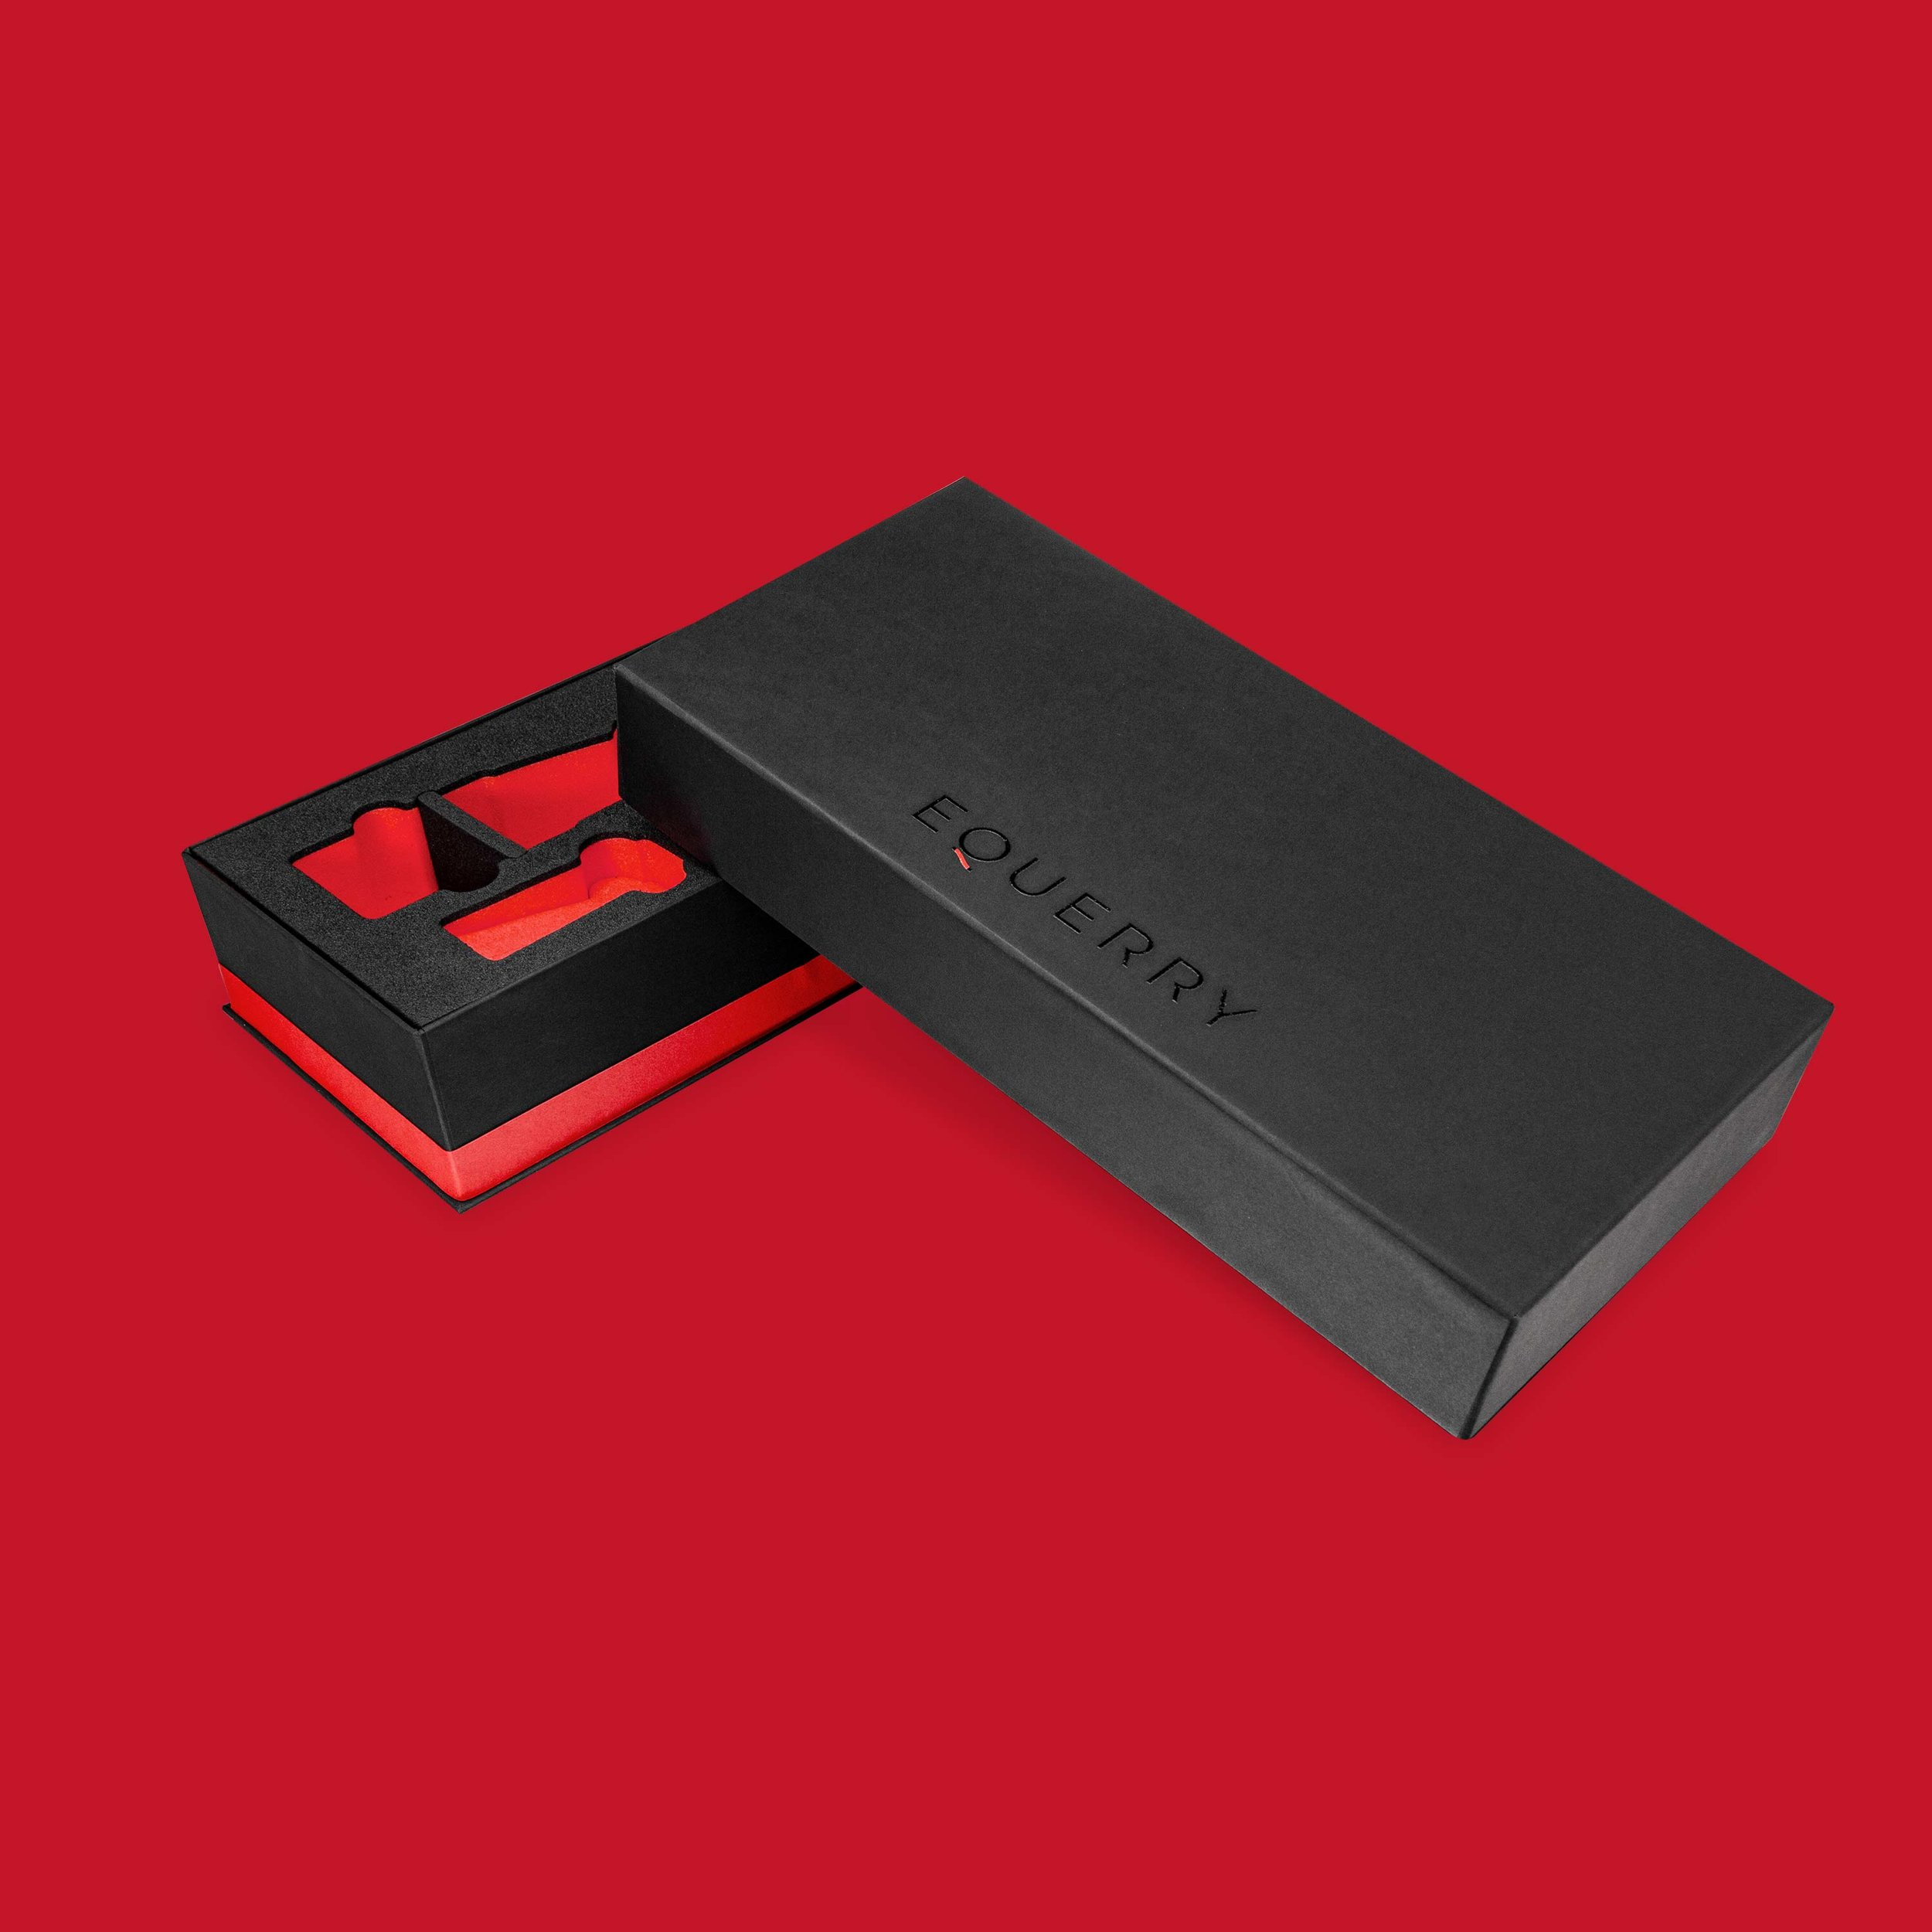 Equerry-Rigid-Foam-Insert-Box-Packaging-Prototype-Design.jpg